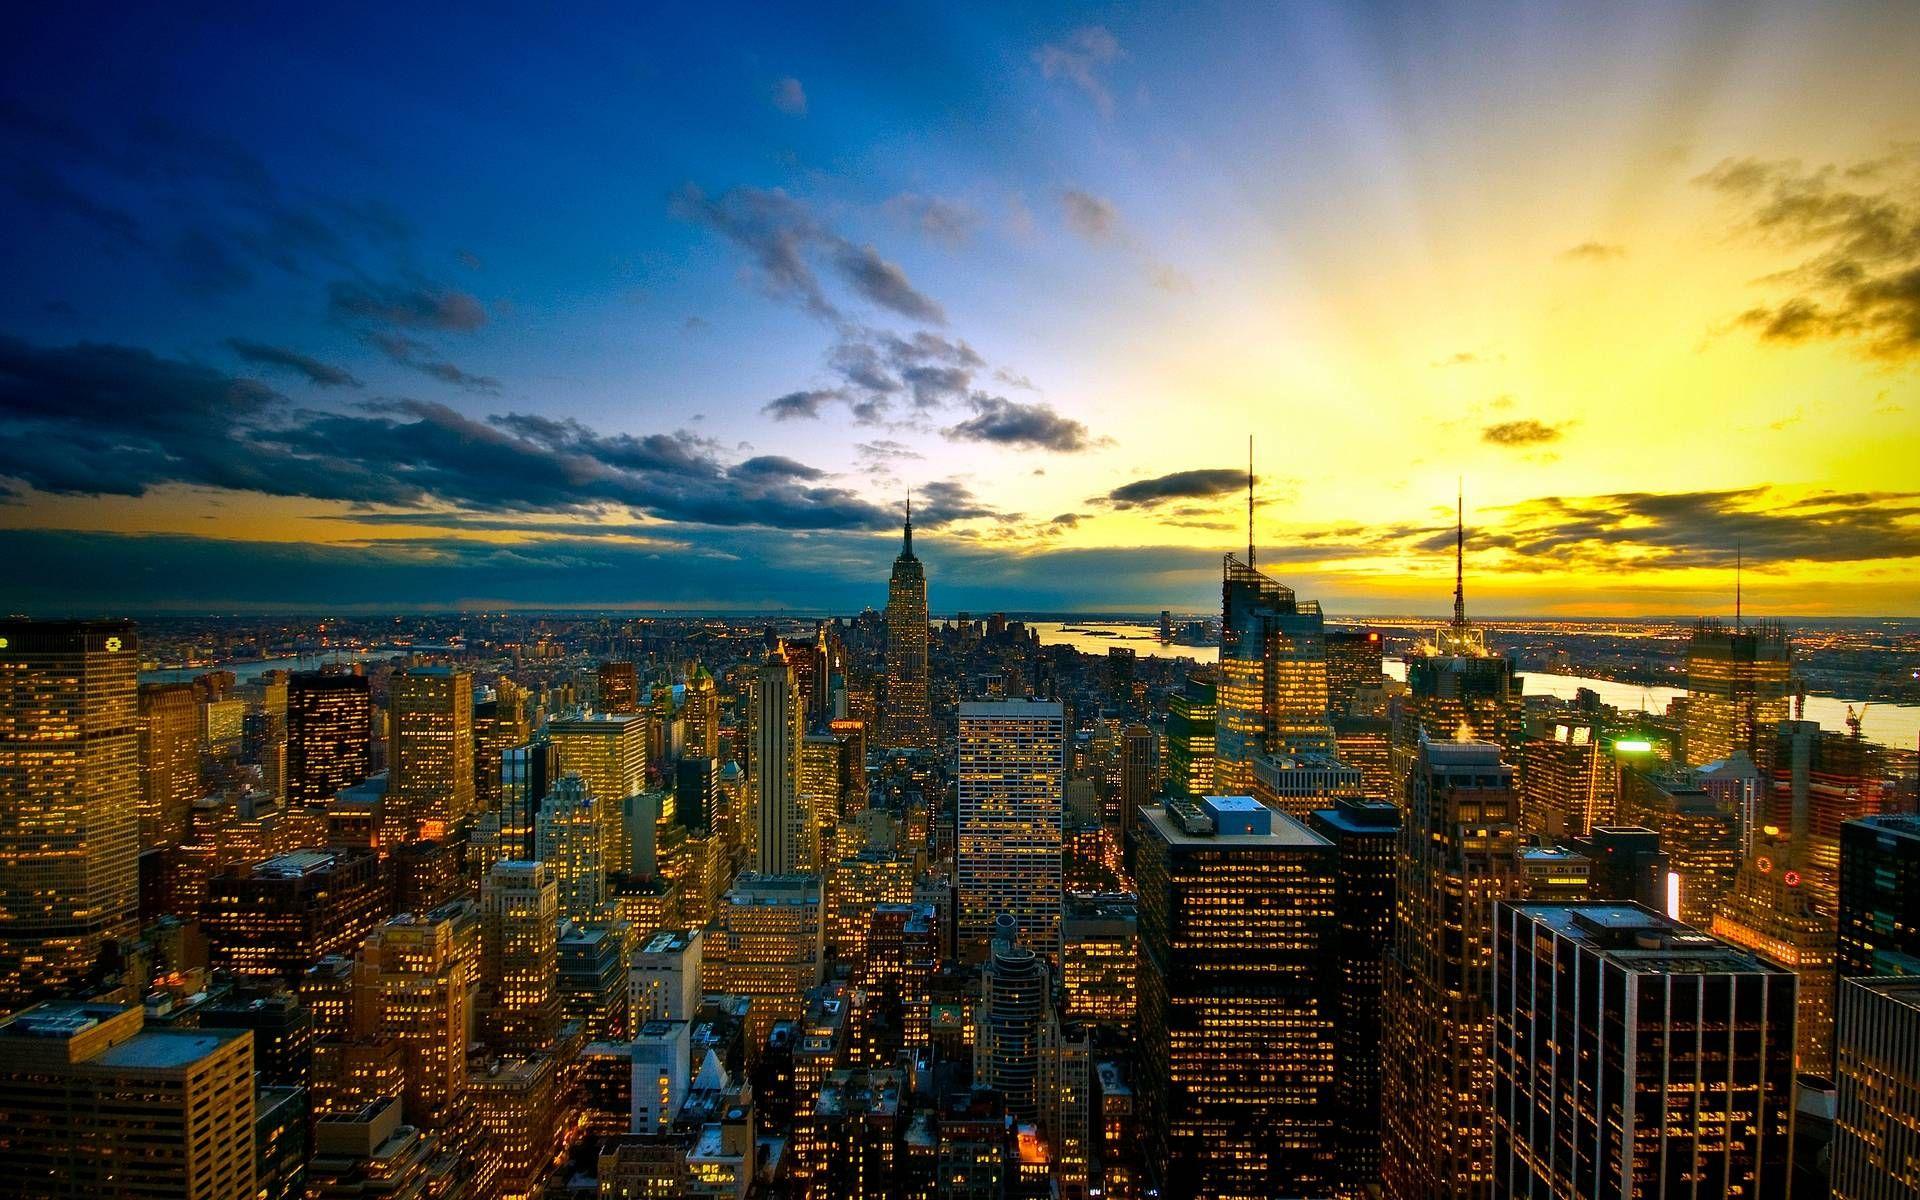 New York City Wallpaper For Walls Hd Wallpaper Collection Hd New York Hotels New York Wallpaper City Wallpaper